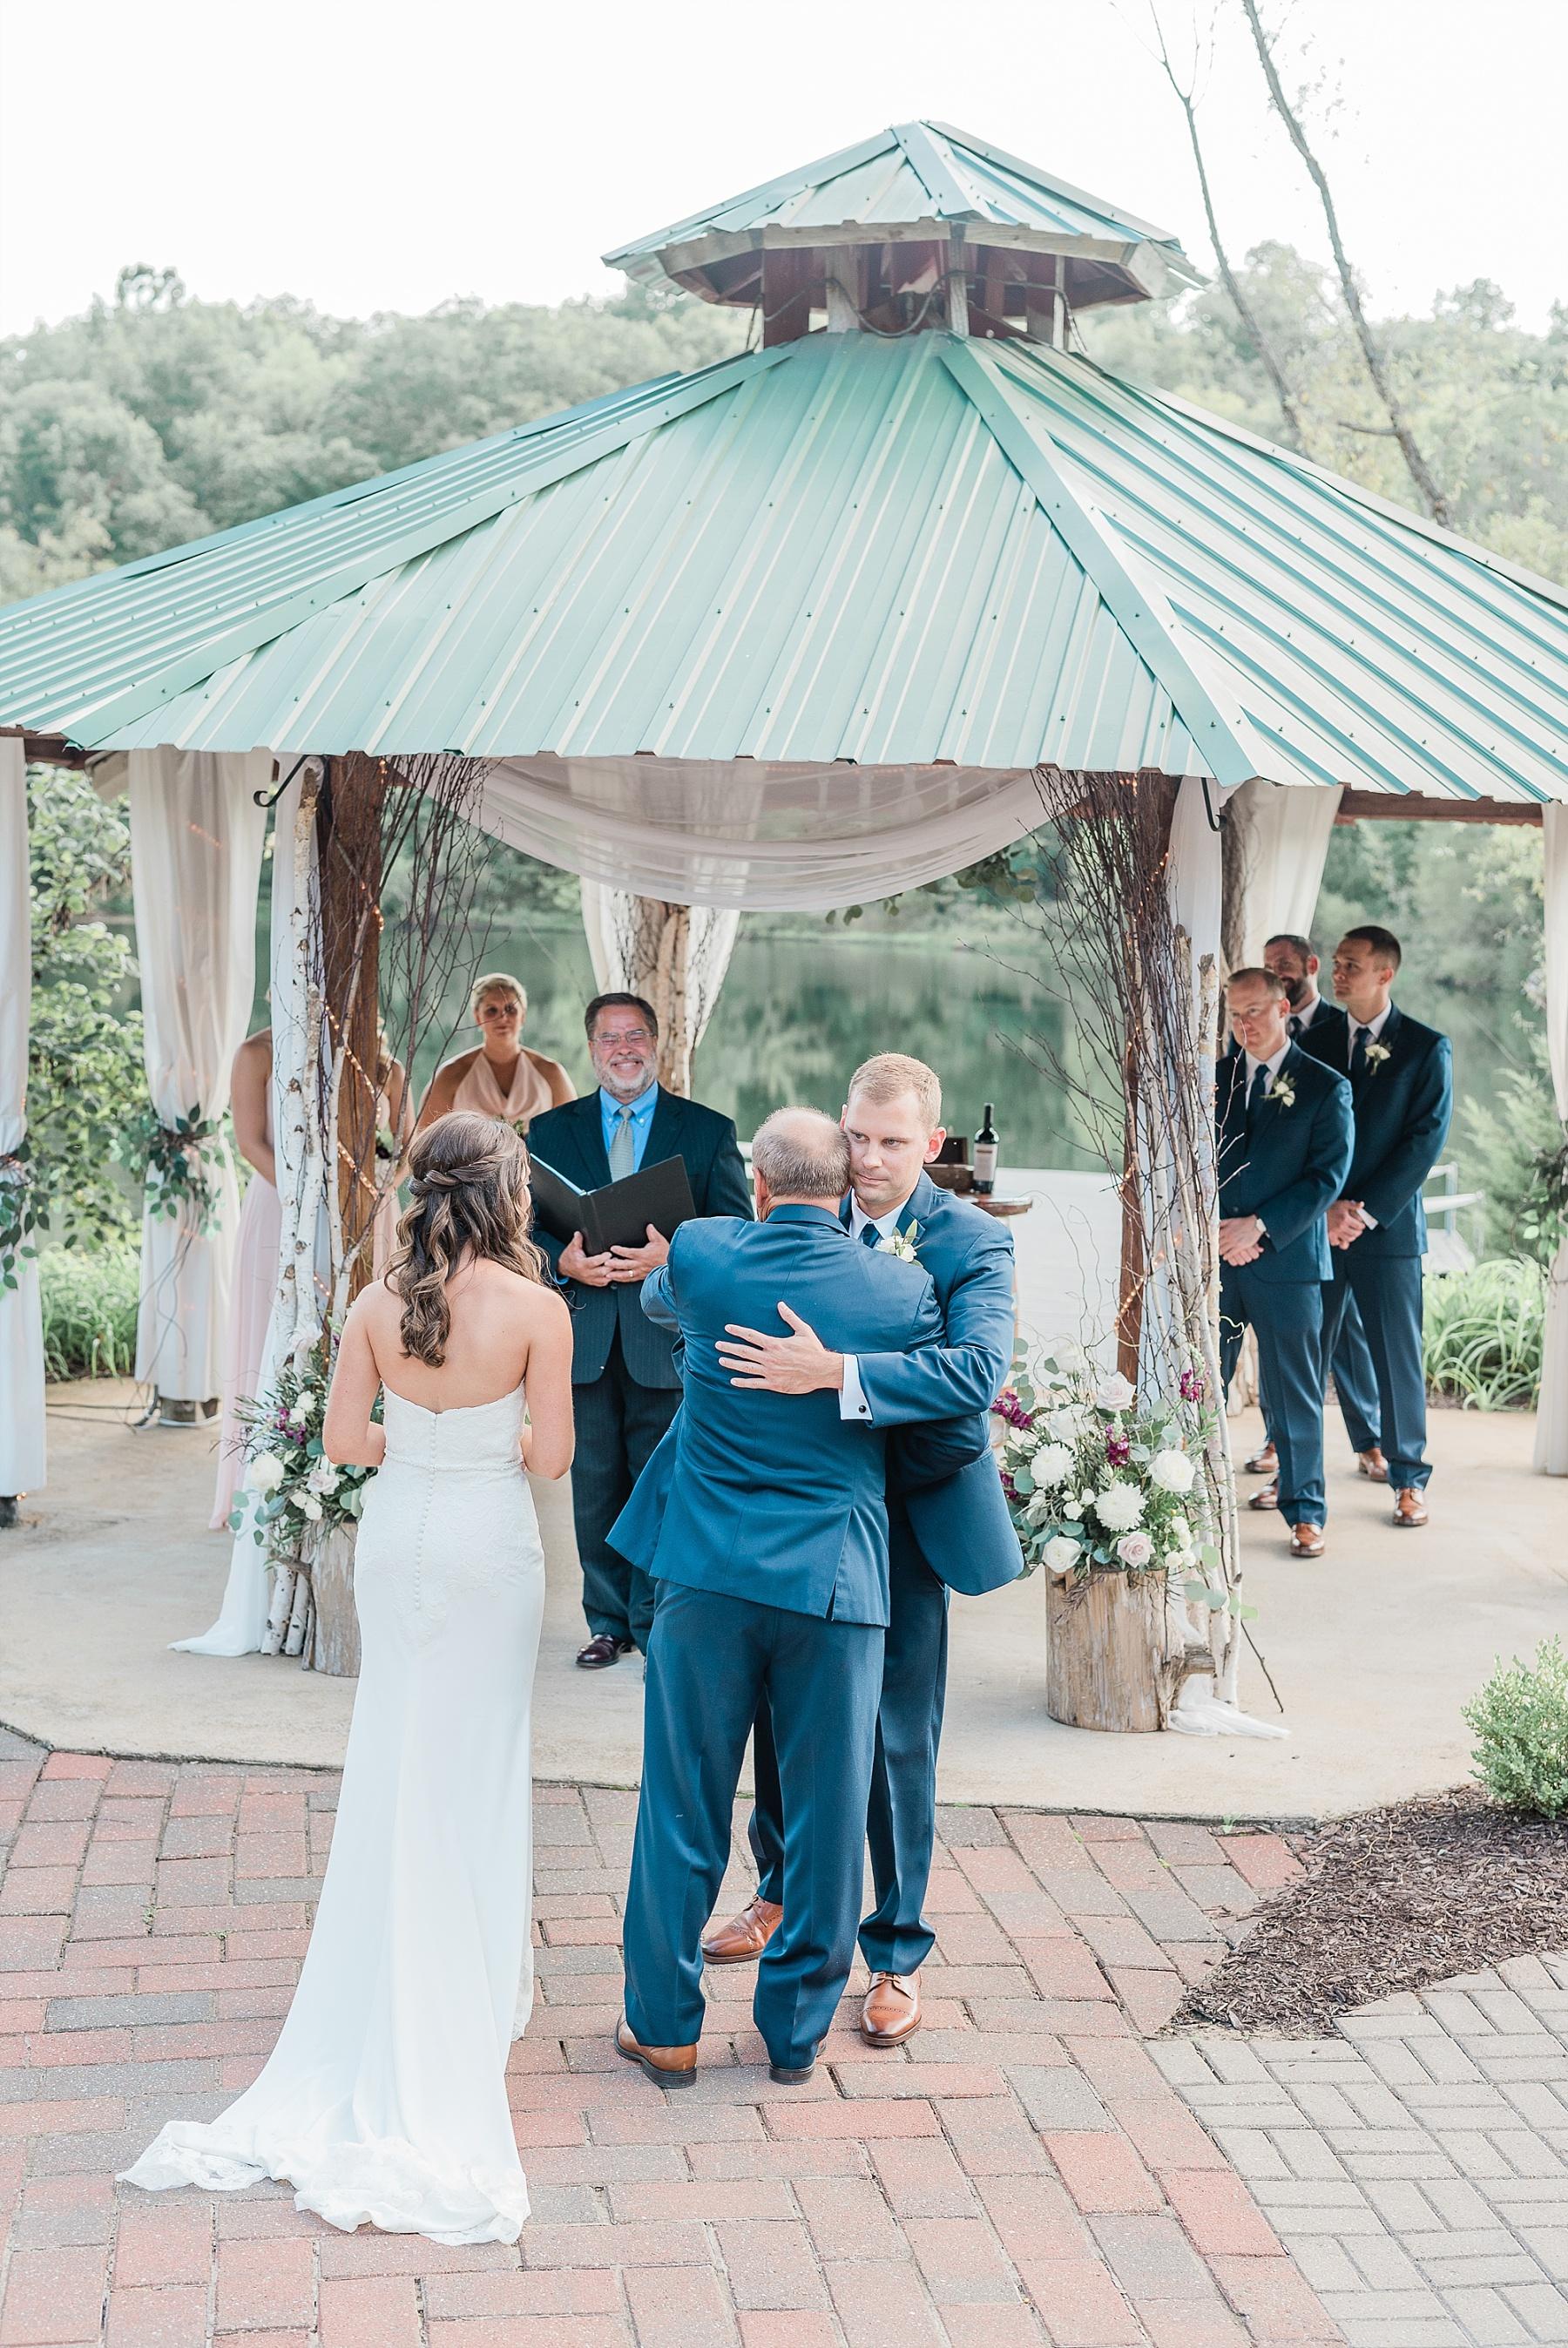 Romantic Summer Sunset Wedding Ceremony at Little Piney Lodge St. Louis Missouri by Kelsi Kliethermes Photography Fine Art Photographer_0055.jpg